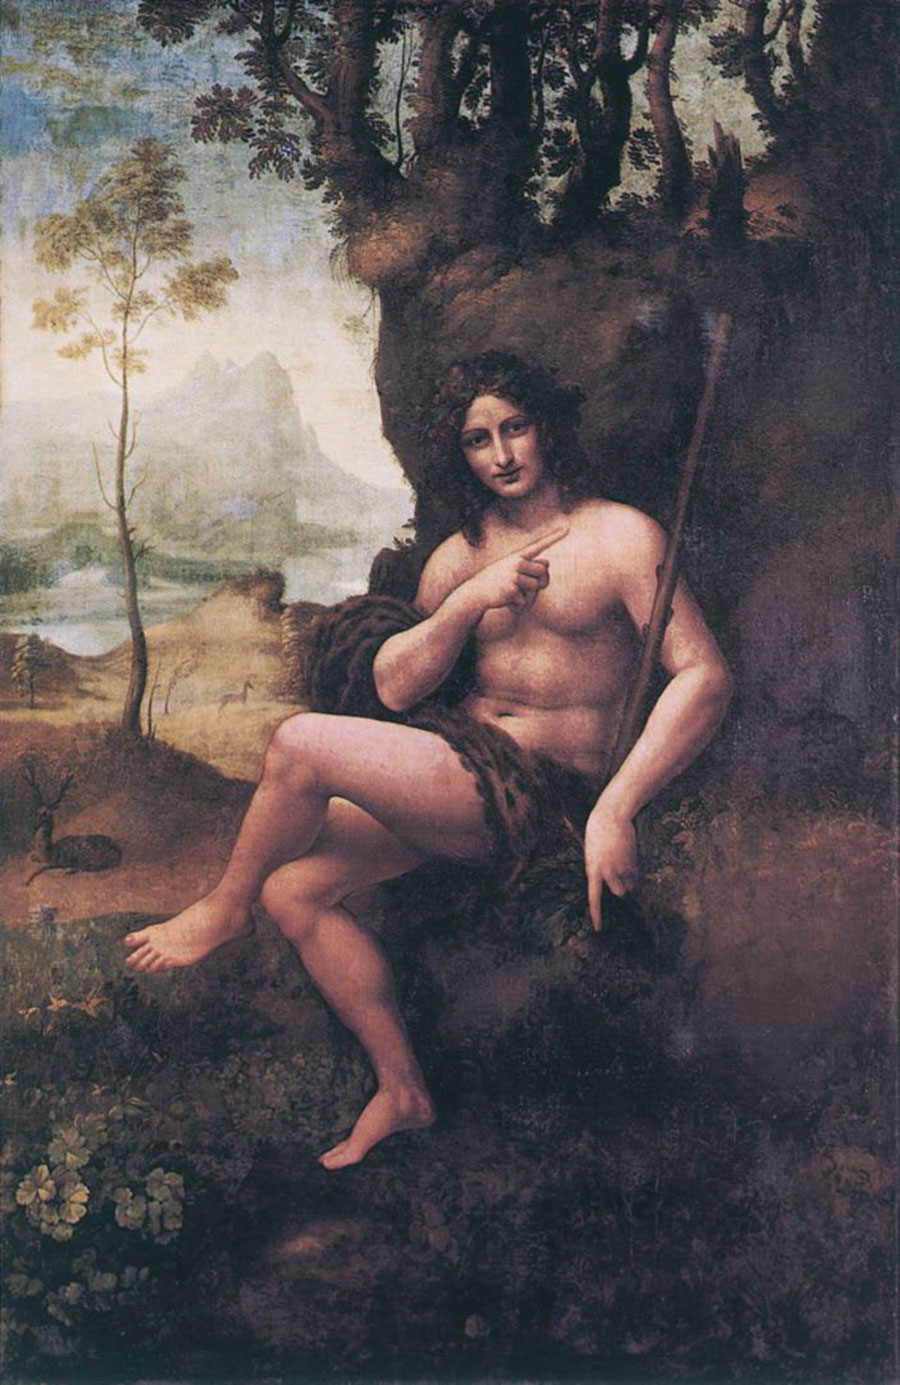 Leonardo da Vinci: Bacco (1510-1515)